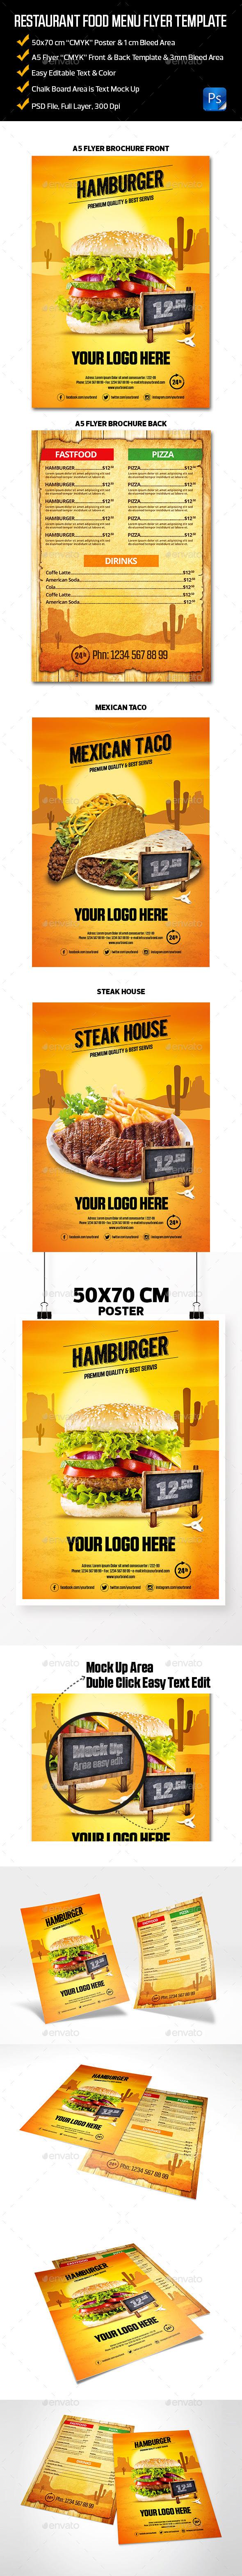 Restaurant Food Menu Flyer Template - Food Menus Print Templates